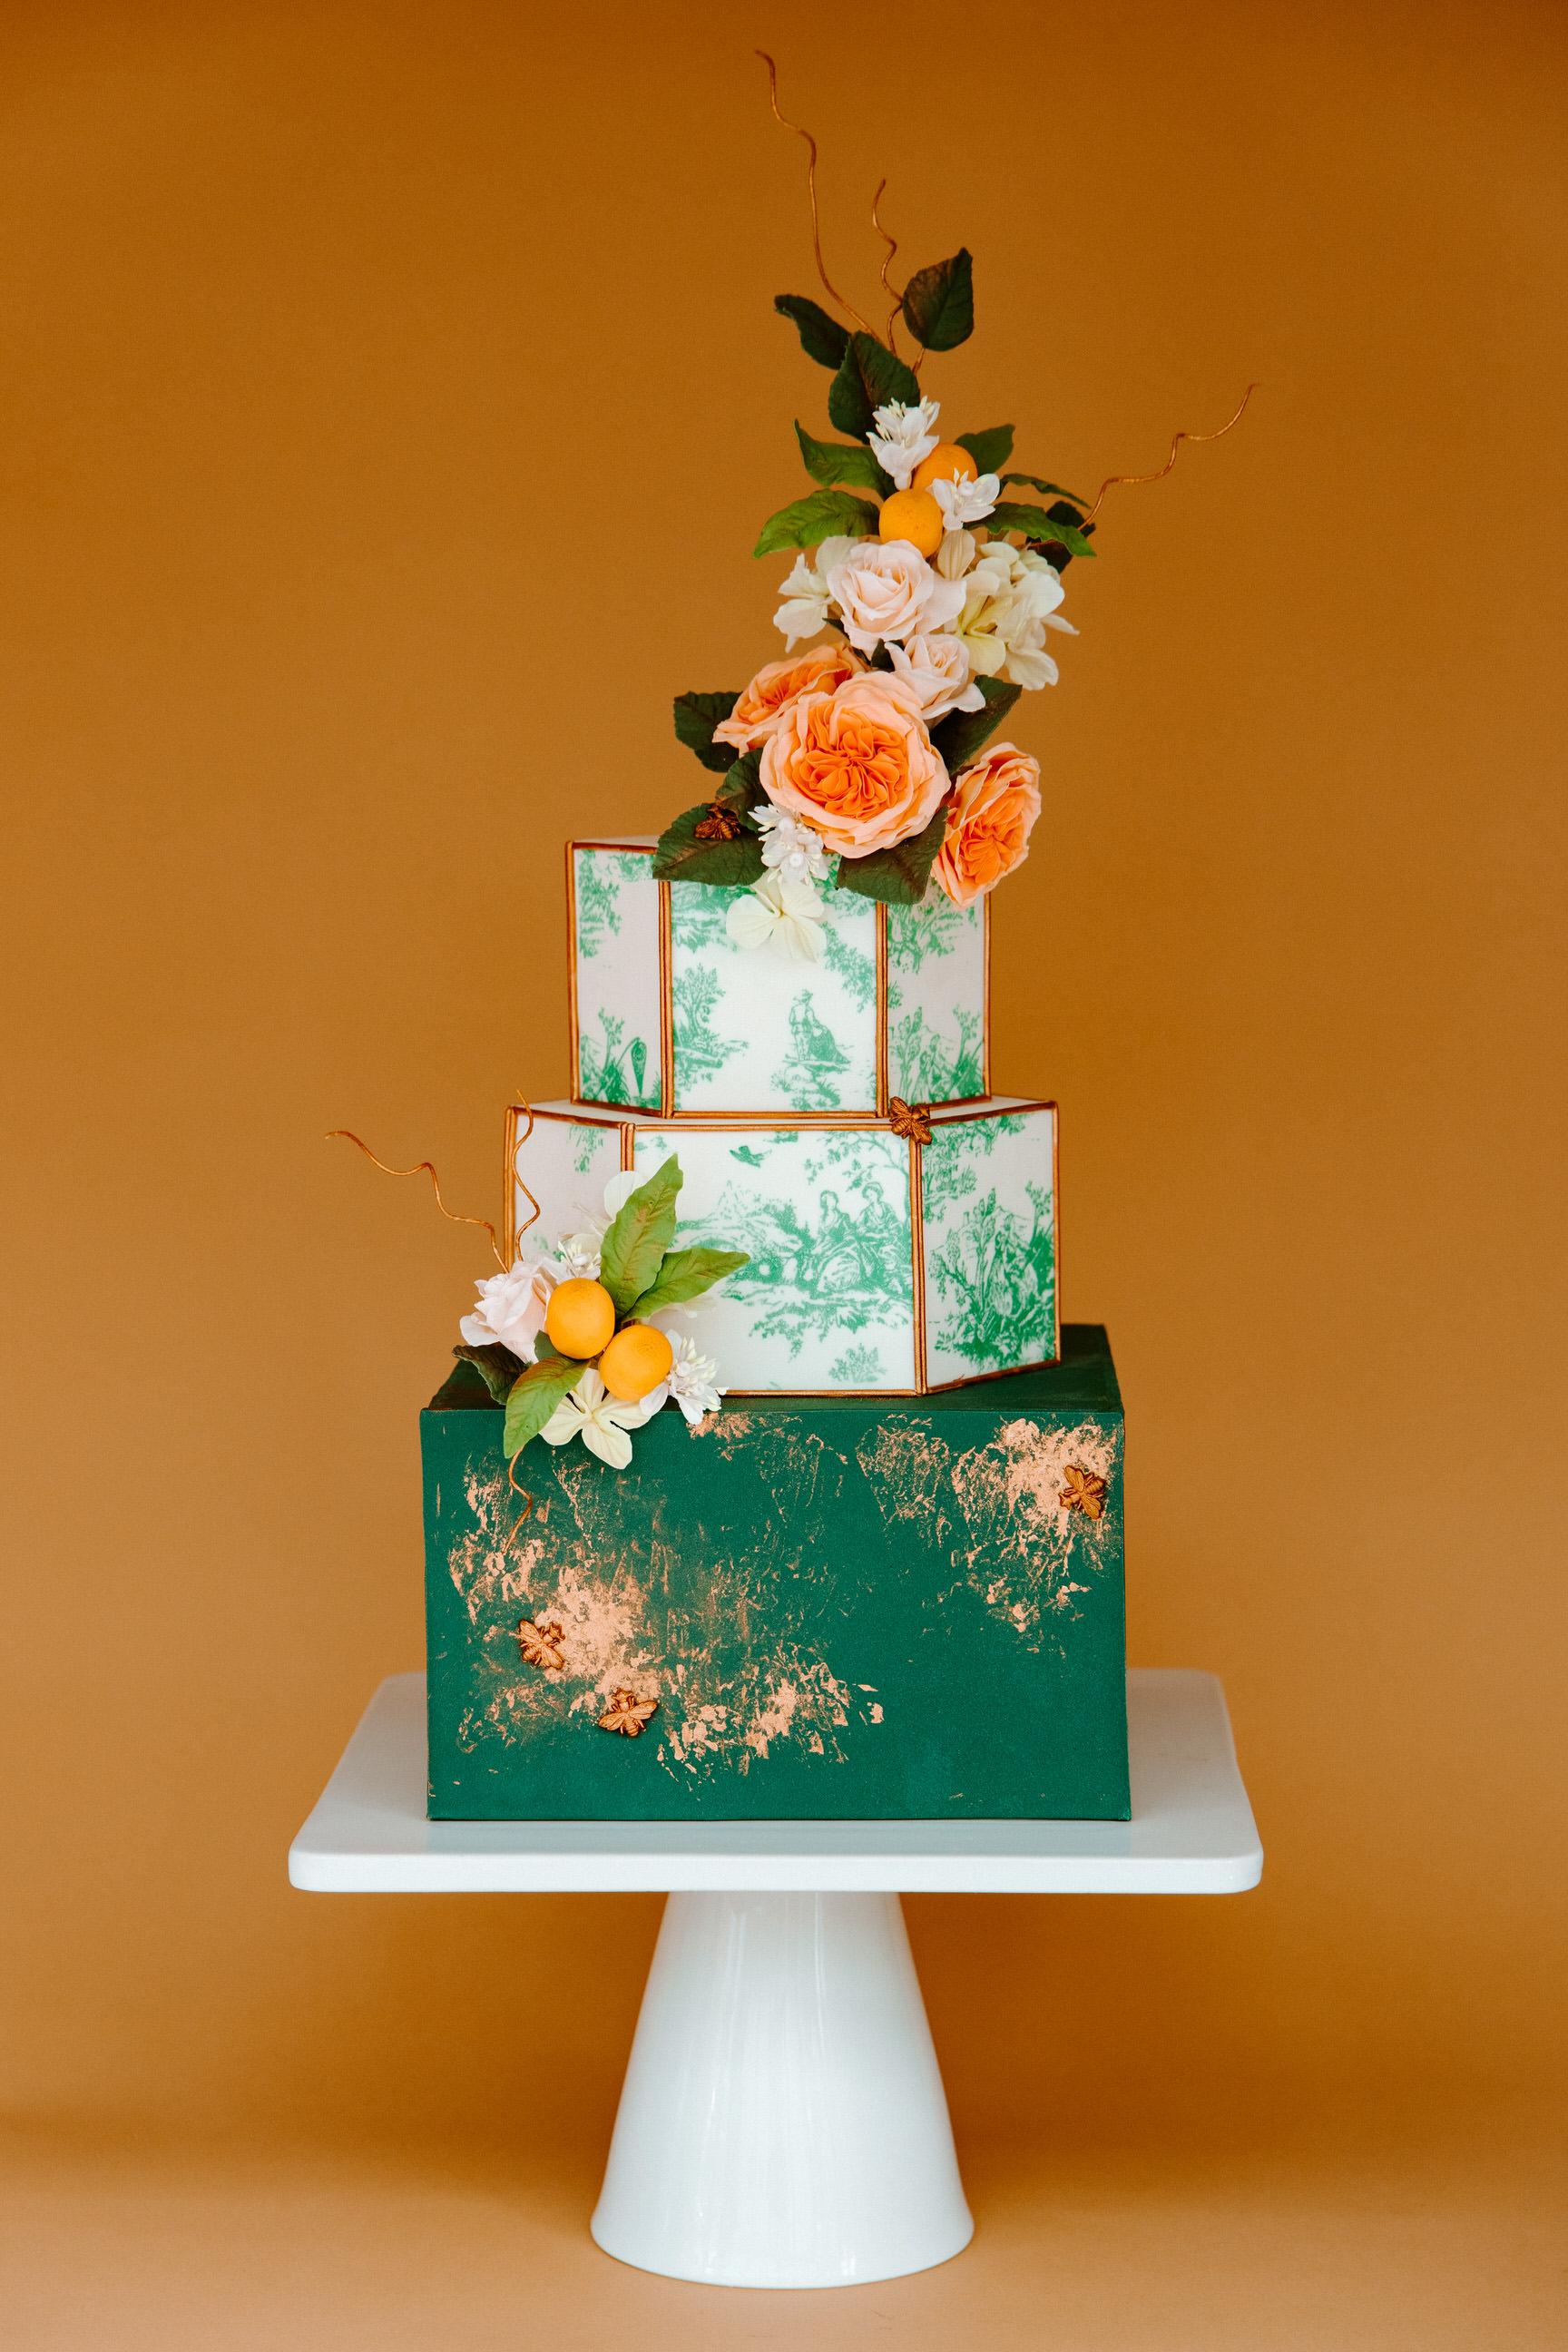 gateaux-cake-7371.jpg